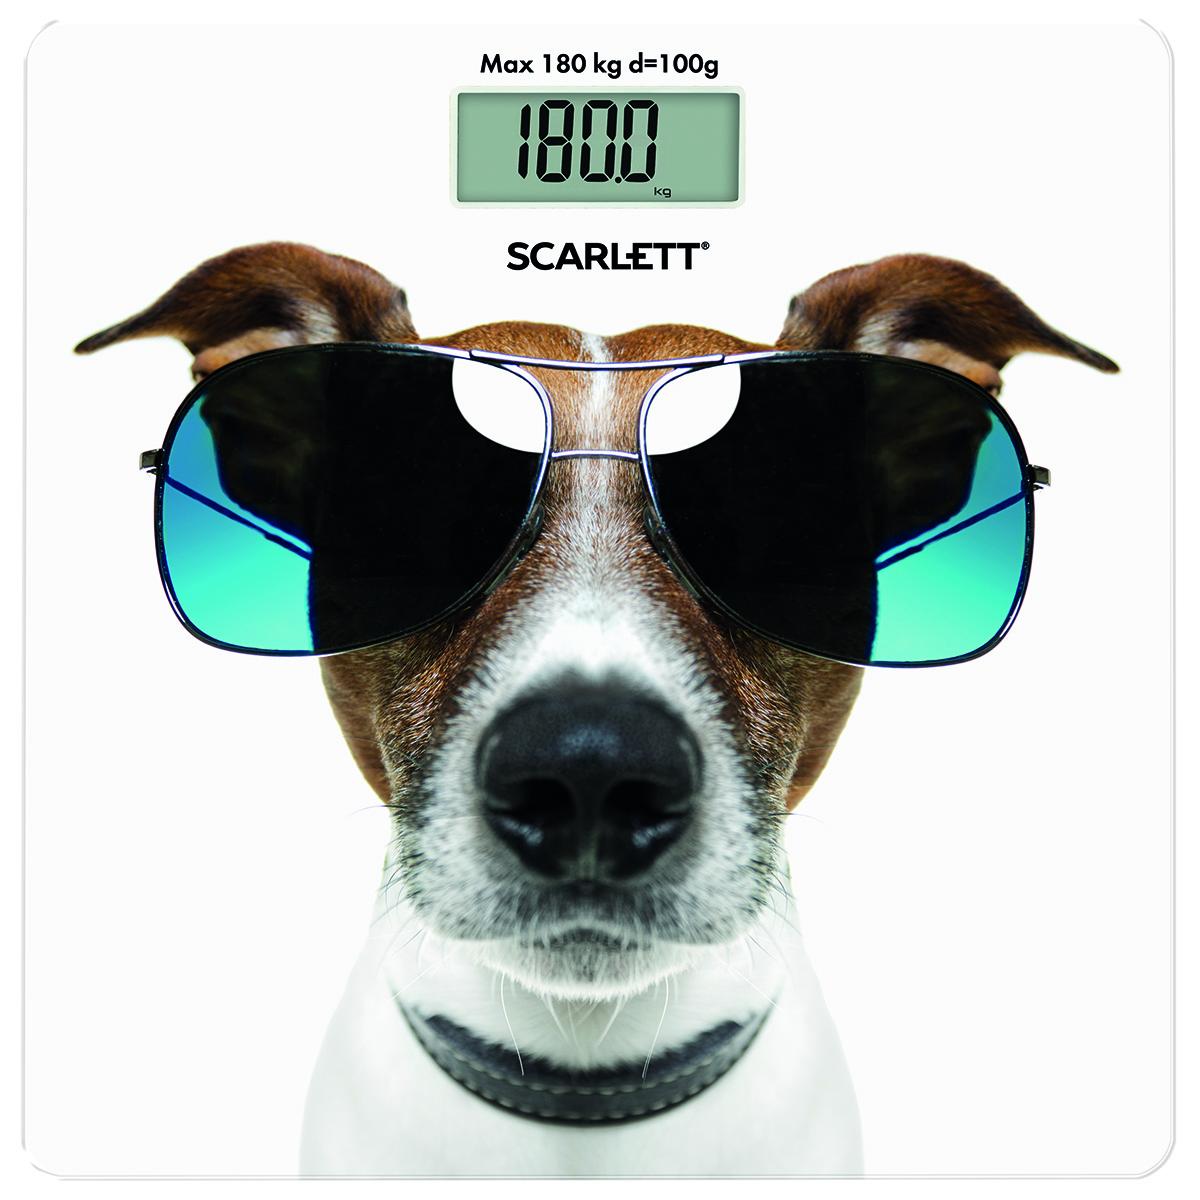 Scarlett SC-BS33E090, Cool Dog весы напольные - Напольные весы